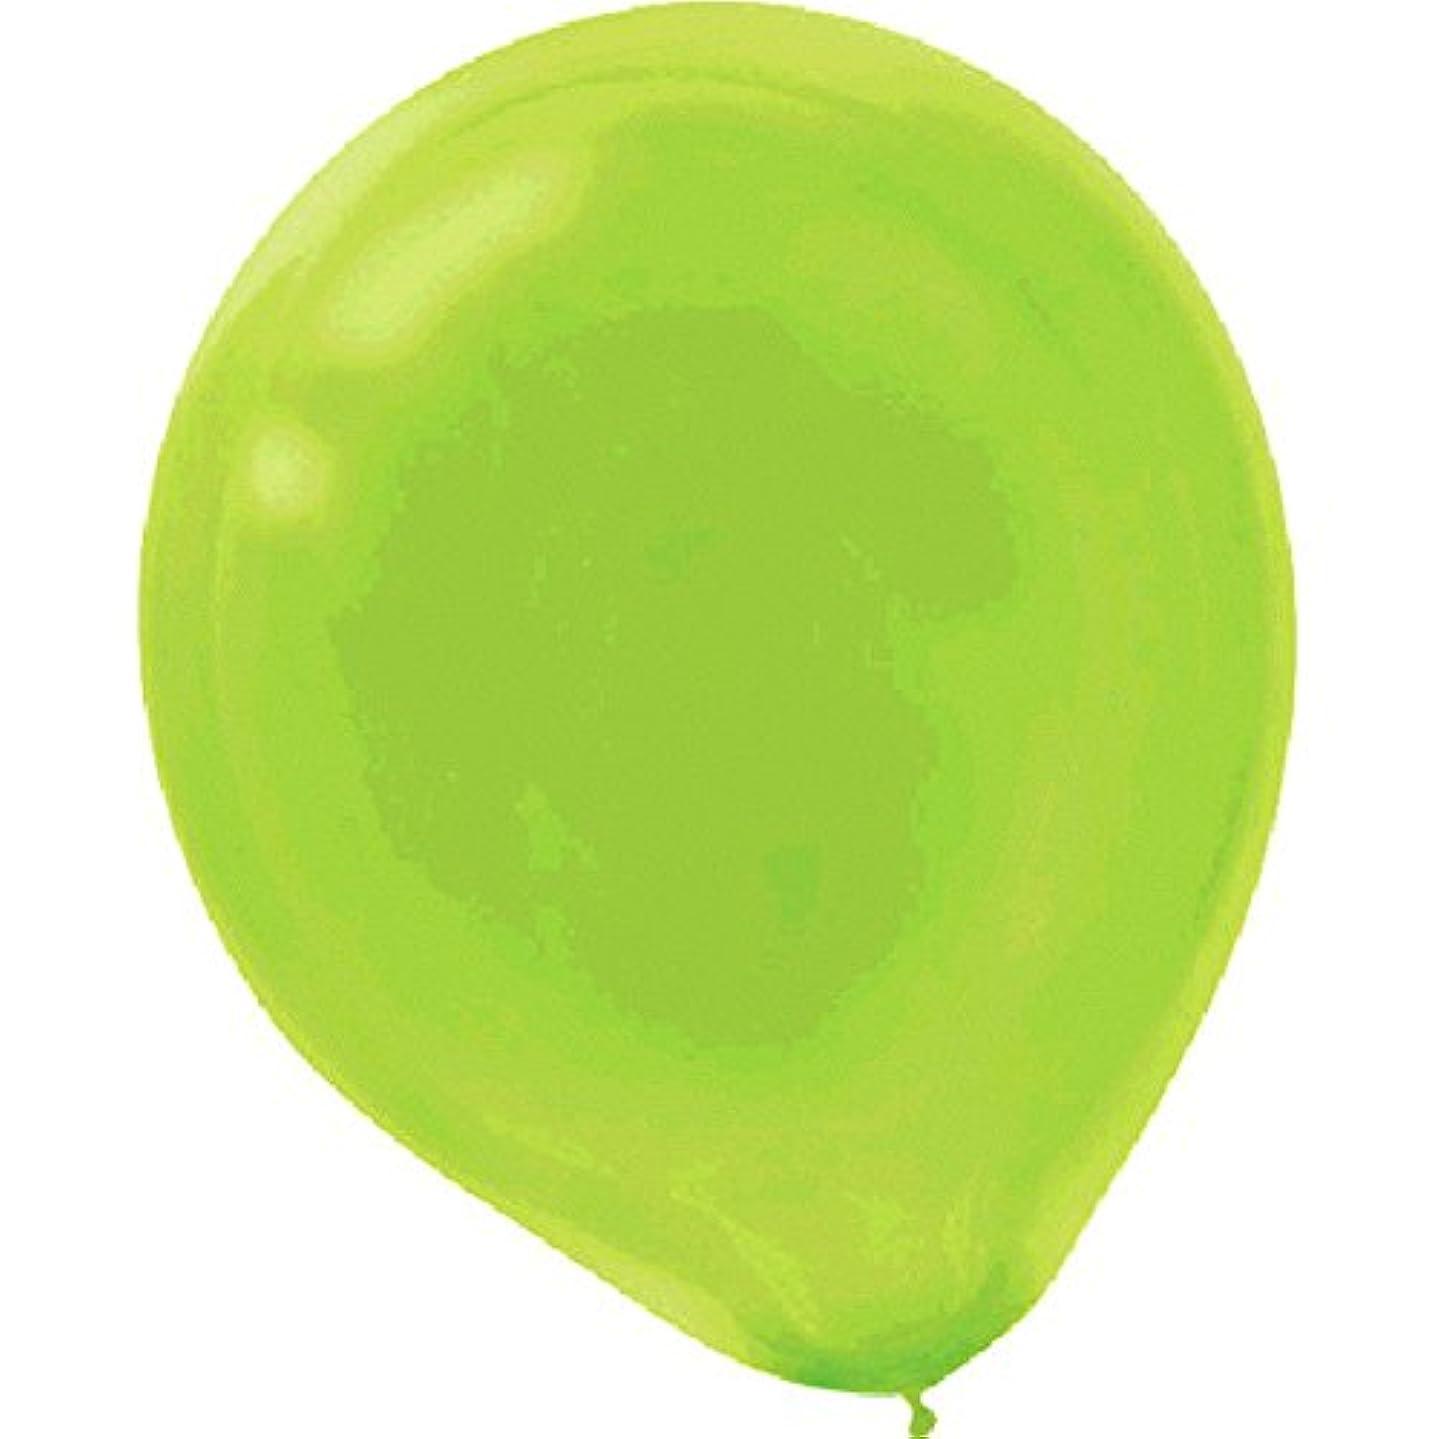 amscan Plain Latex Balloons | Kiwi Green | Party Decor | 600 Ct.